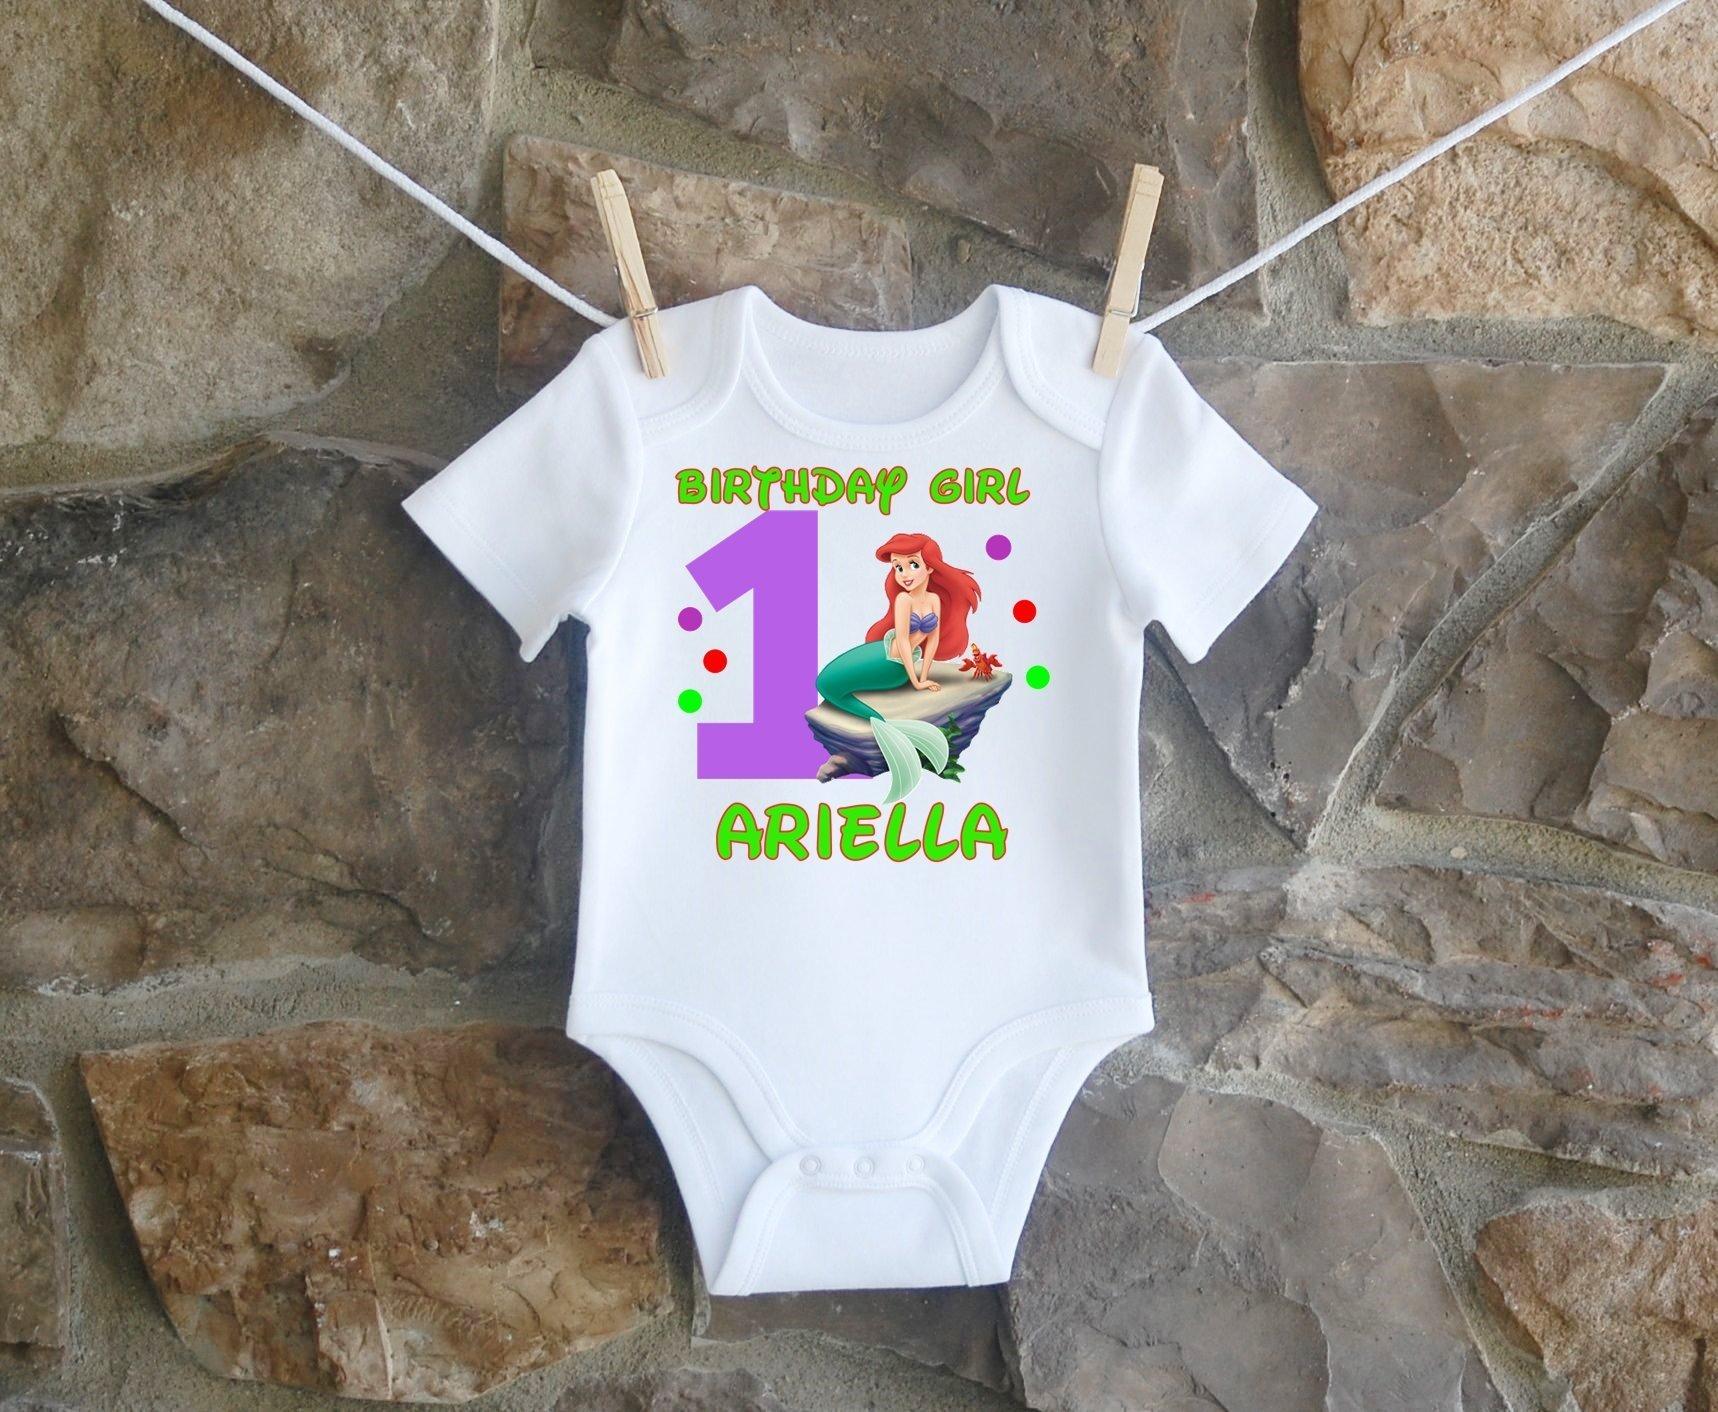 The Little Mermaid Birthday Shirt, The Little Mermaid Birthday Shirt For Girls, Personalized Girls Ariel The Little Mermaid Birthday Shirt, Customized The Little Mermaid Ariel Birthday Shirt